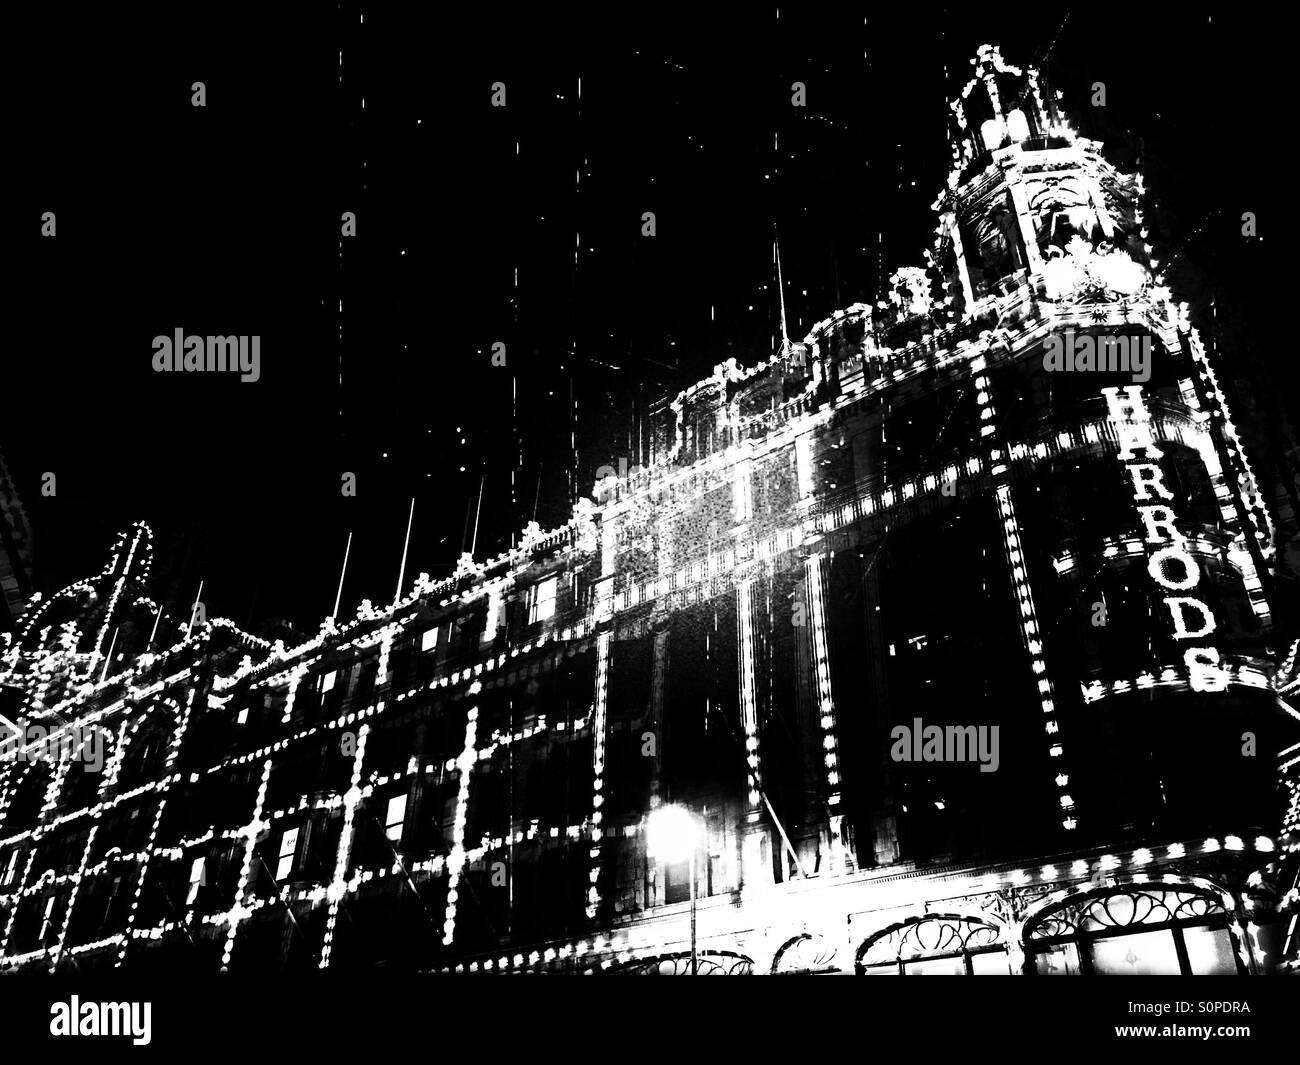 Harrods at night, Brompton Road, Knightsbridge, Royal Borough of Kensington and Chelsea, Central London, England, Stock Photo